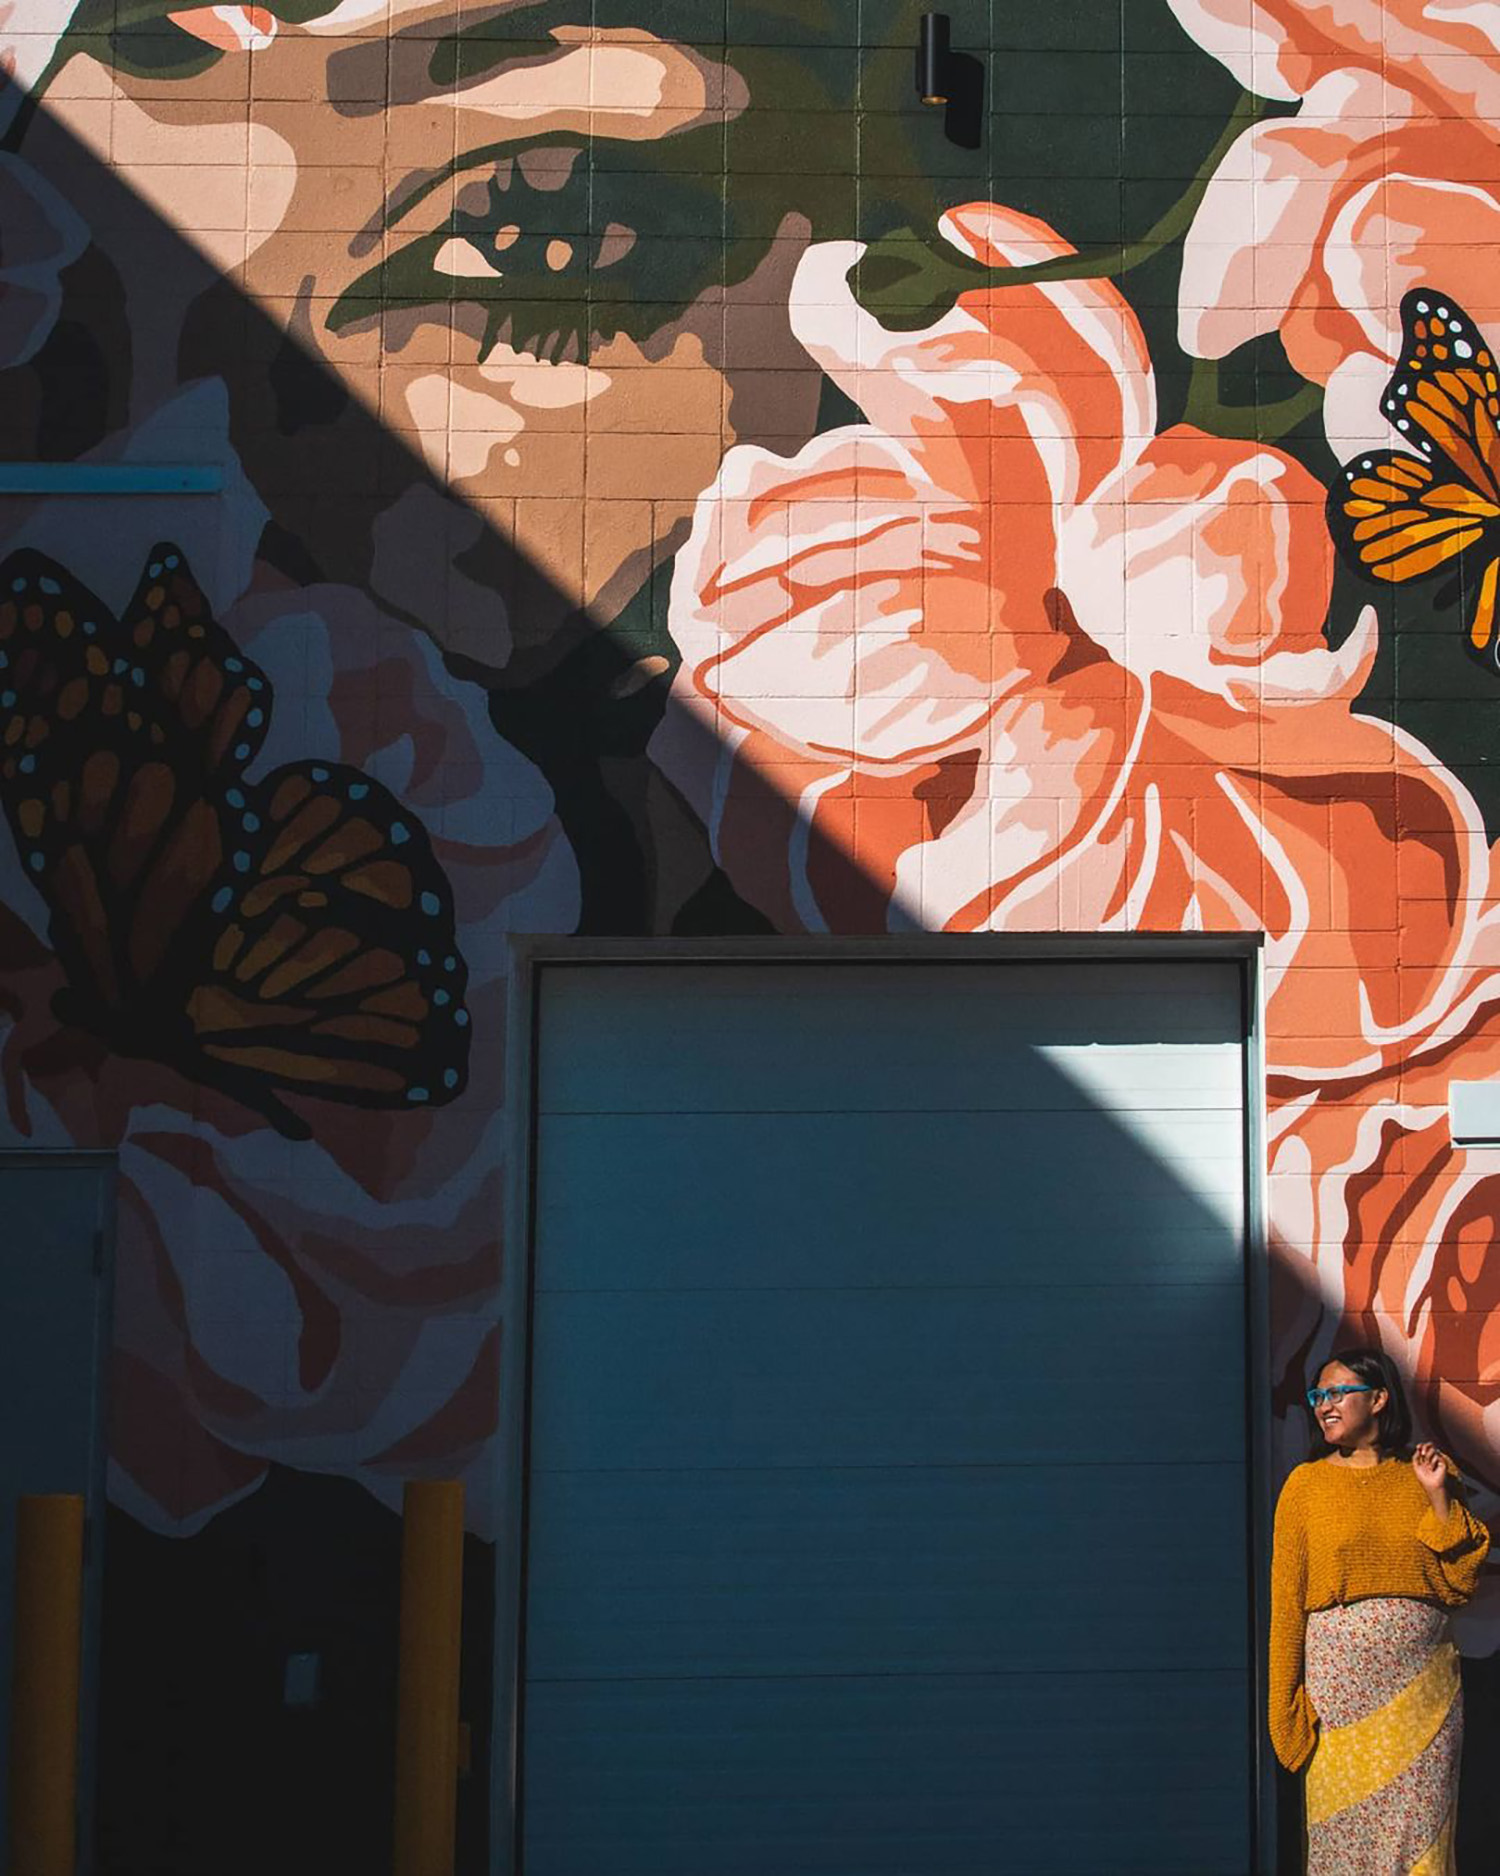 Instagrammable Walls of Edmonton - Explore Edmonton - Murals - Walls - Alixandra Jade - Lady of Manchester Square